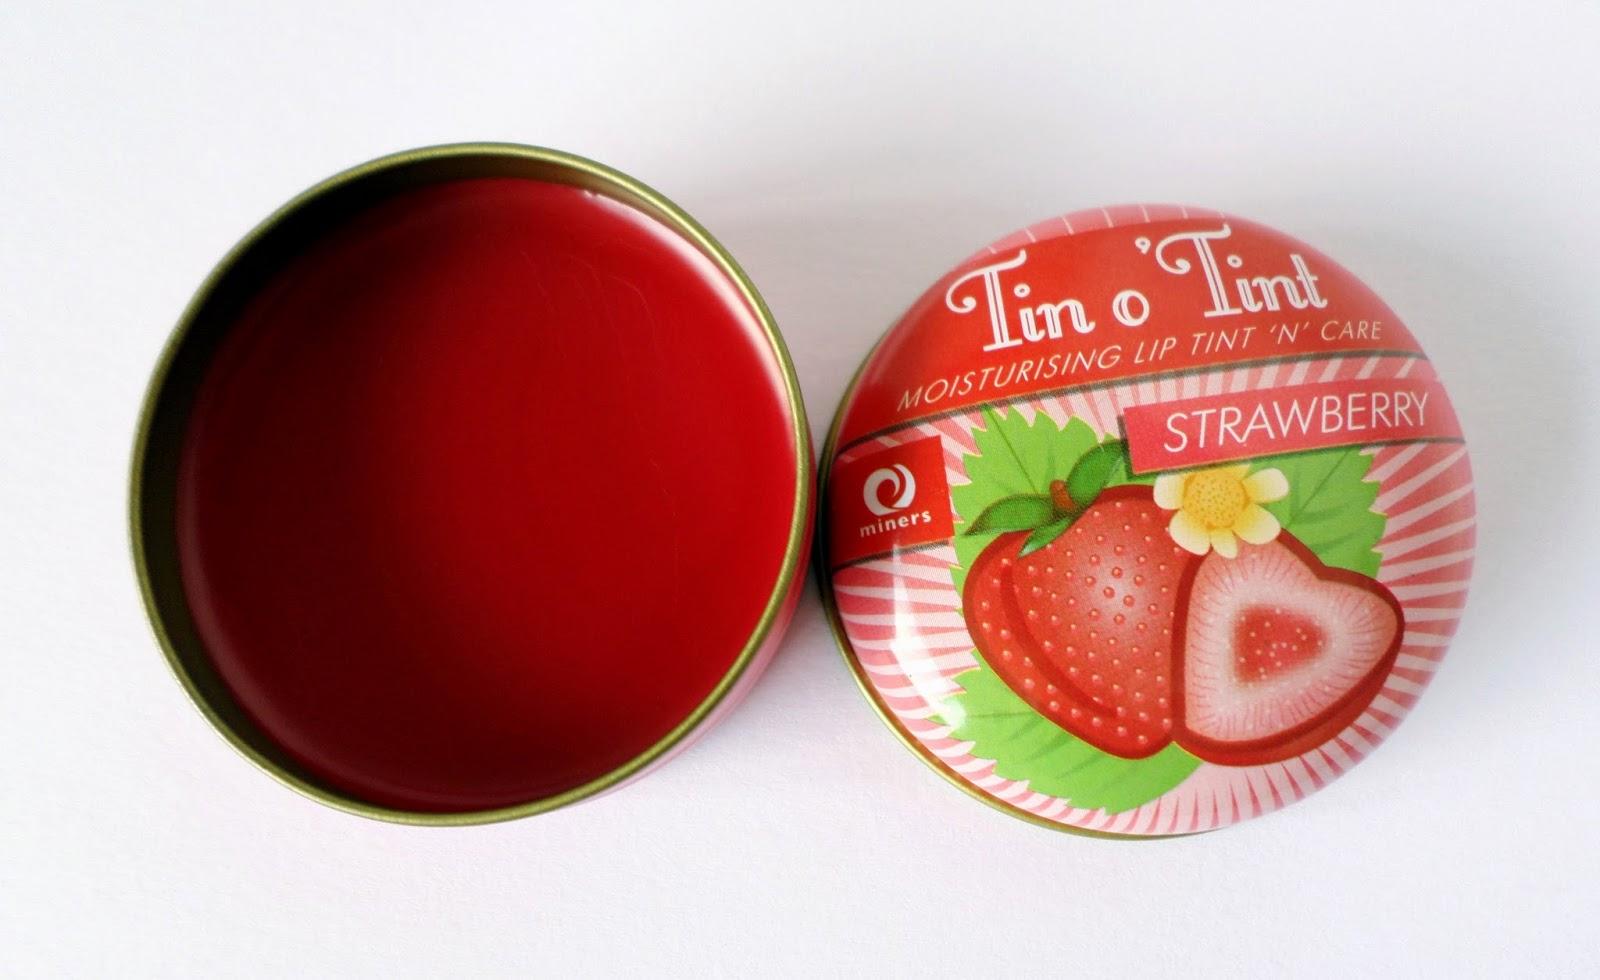 Miners Cosmetics Strawberry Tin o' Tint Tinted Lip Balm